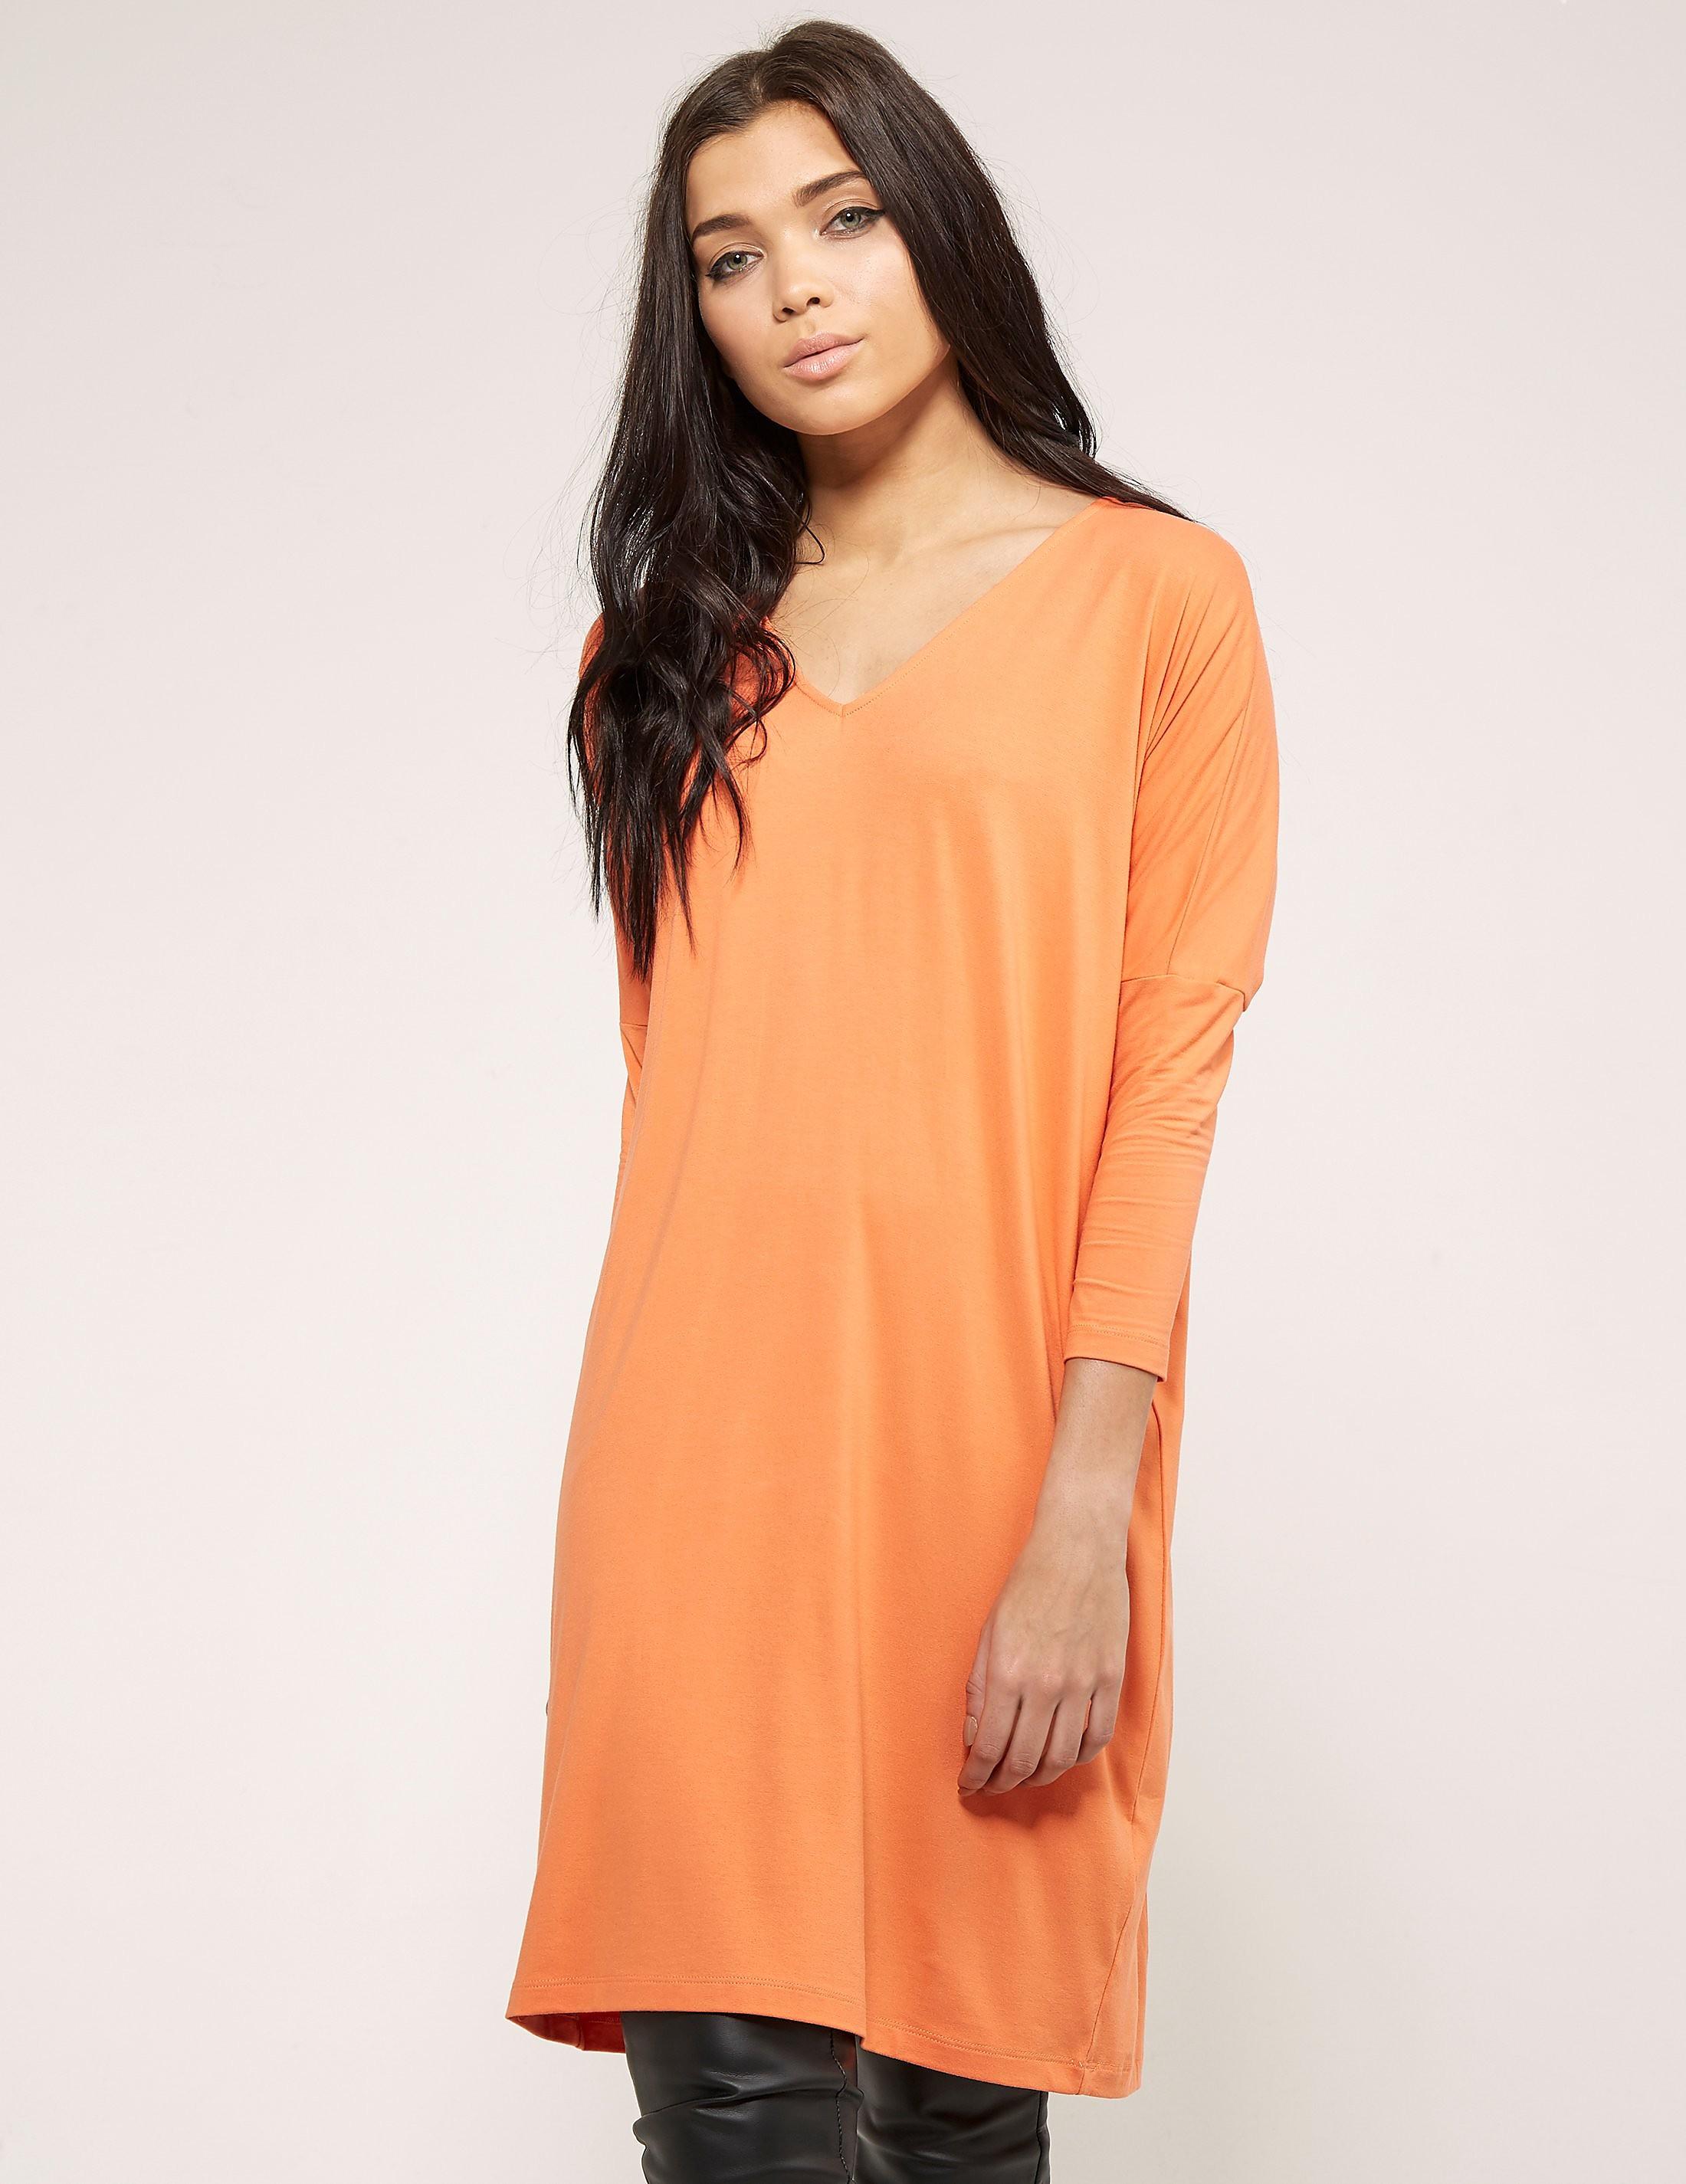 Ilse Jacobsen 3/4 Sleeve T-Shirt Jersey Tunic